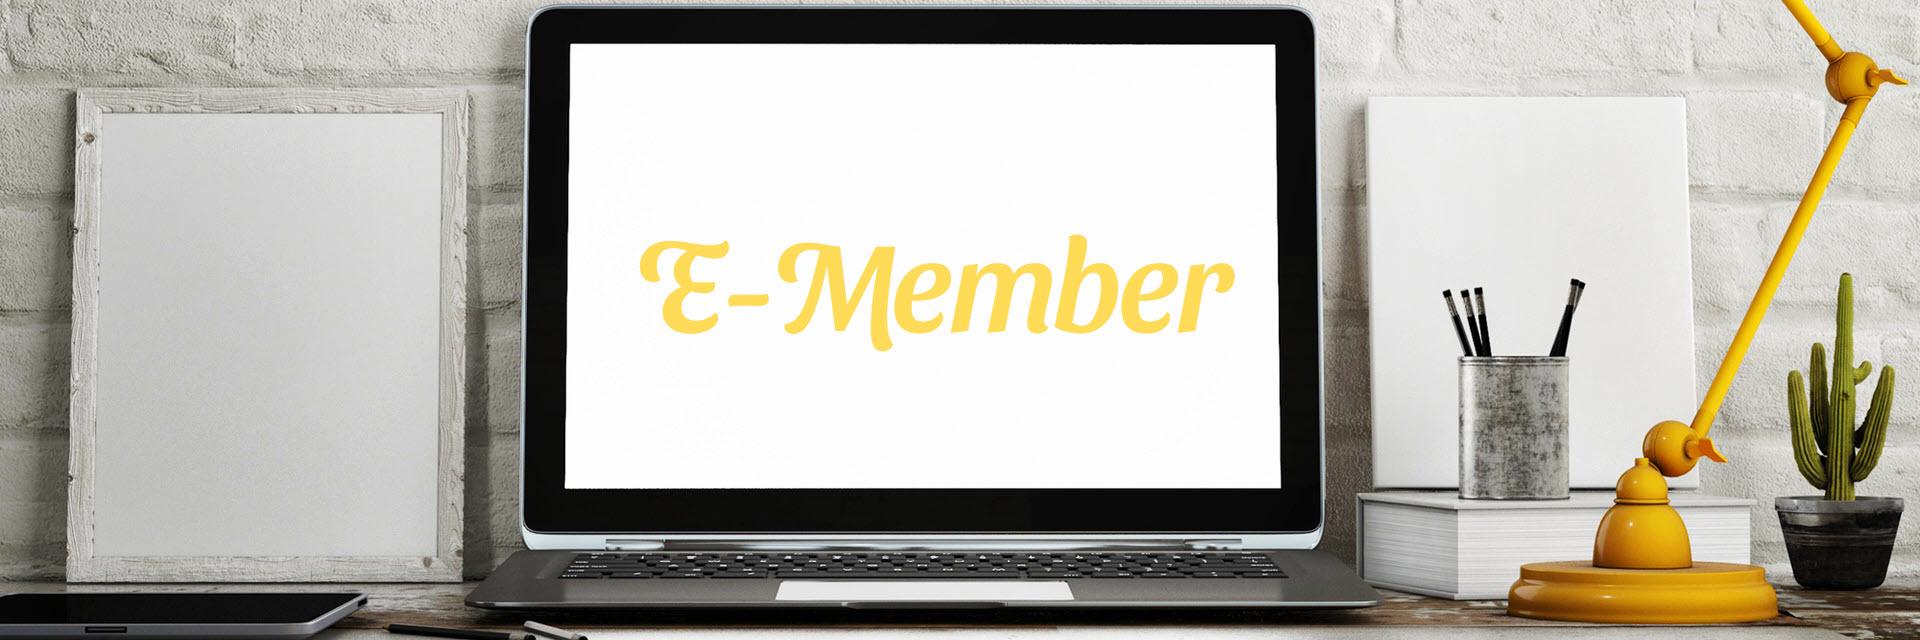 E-Member